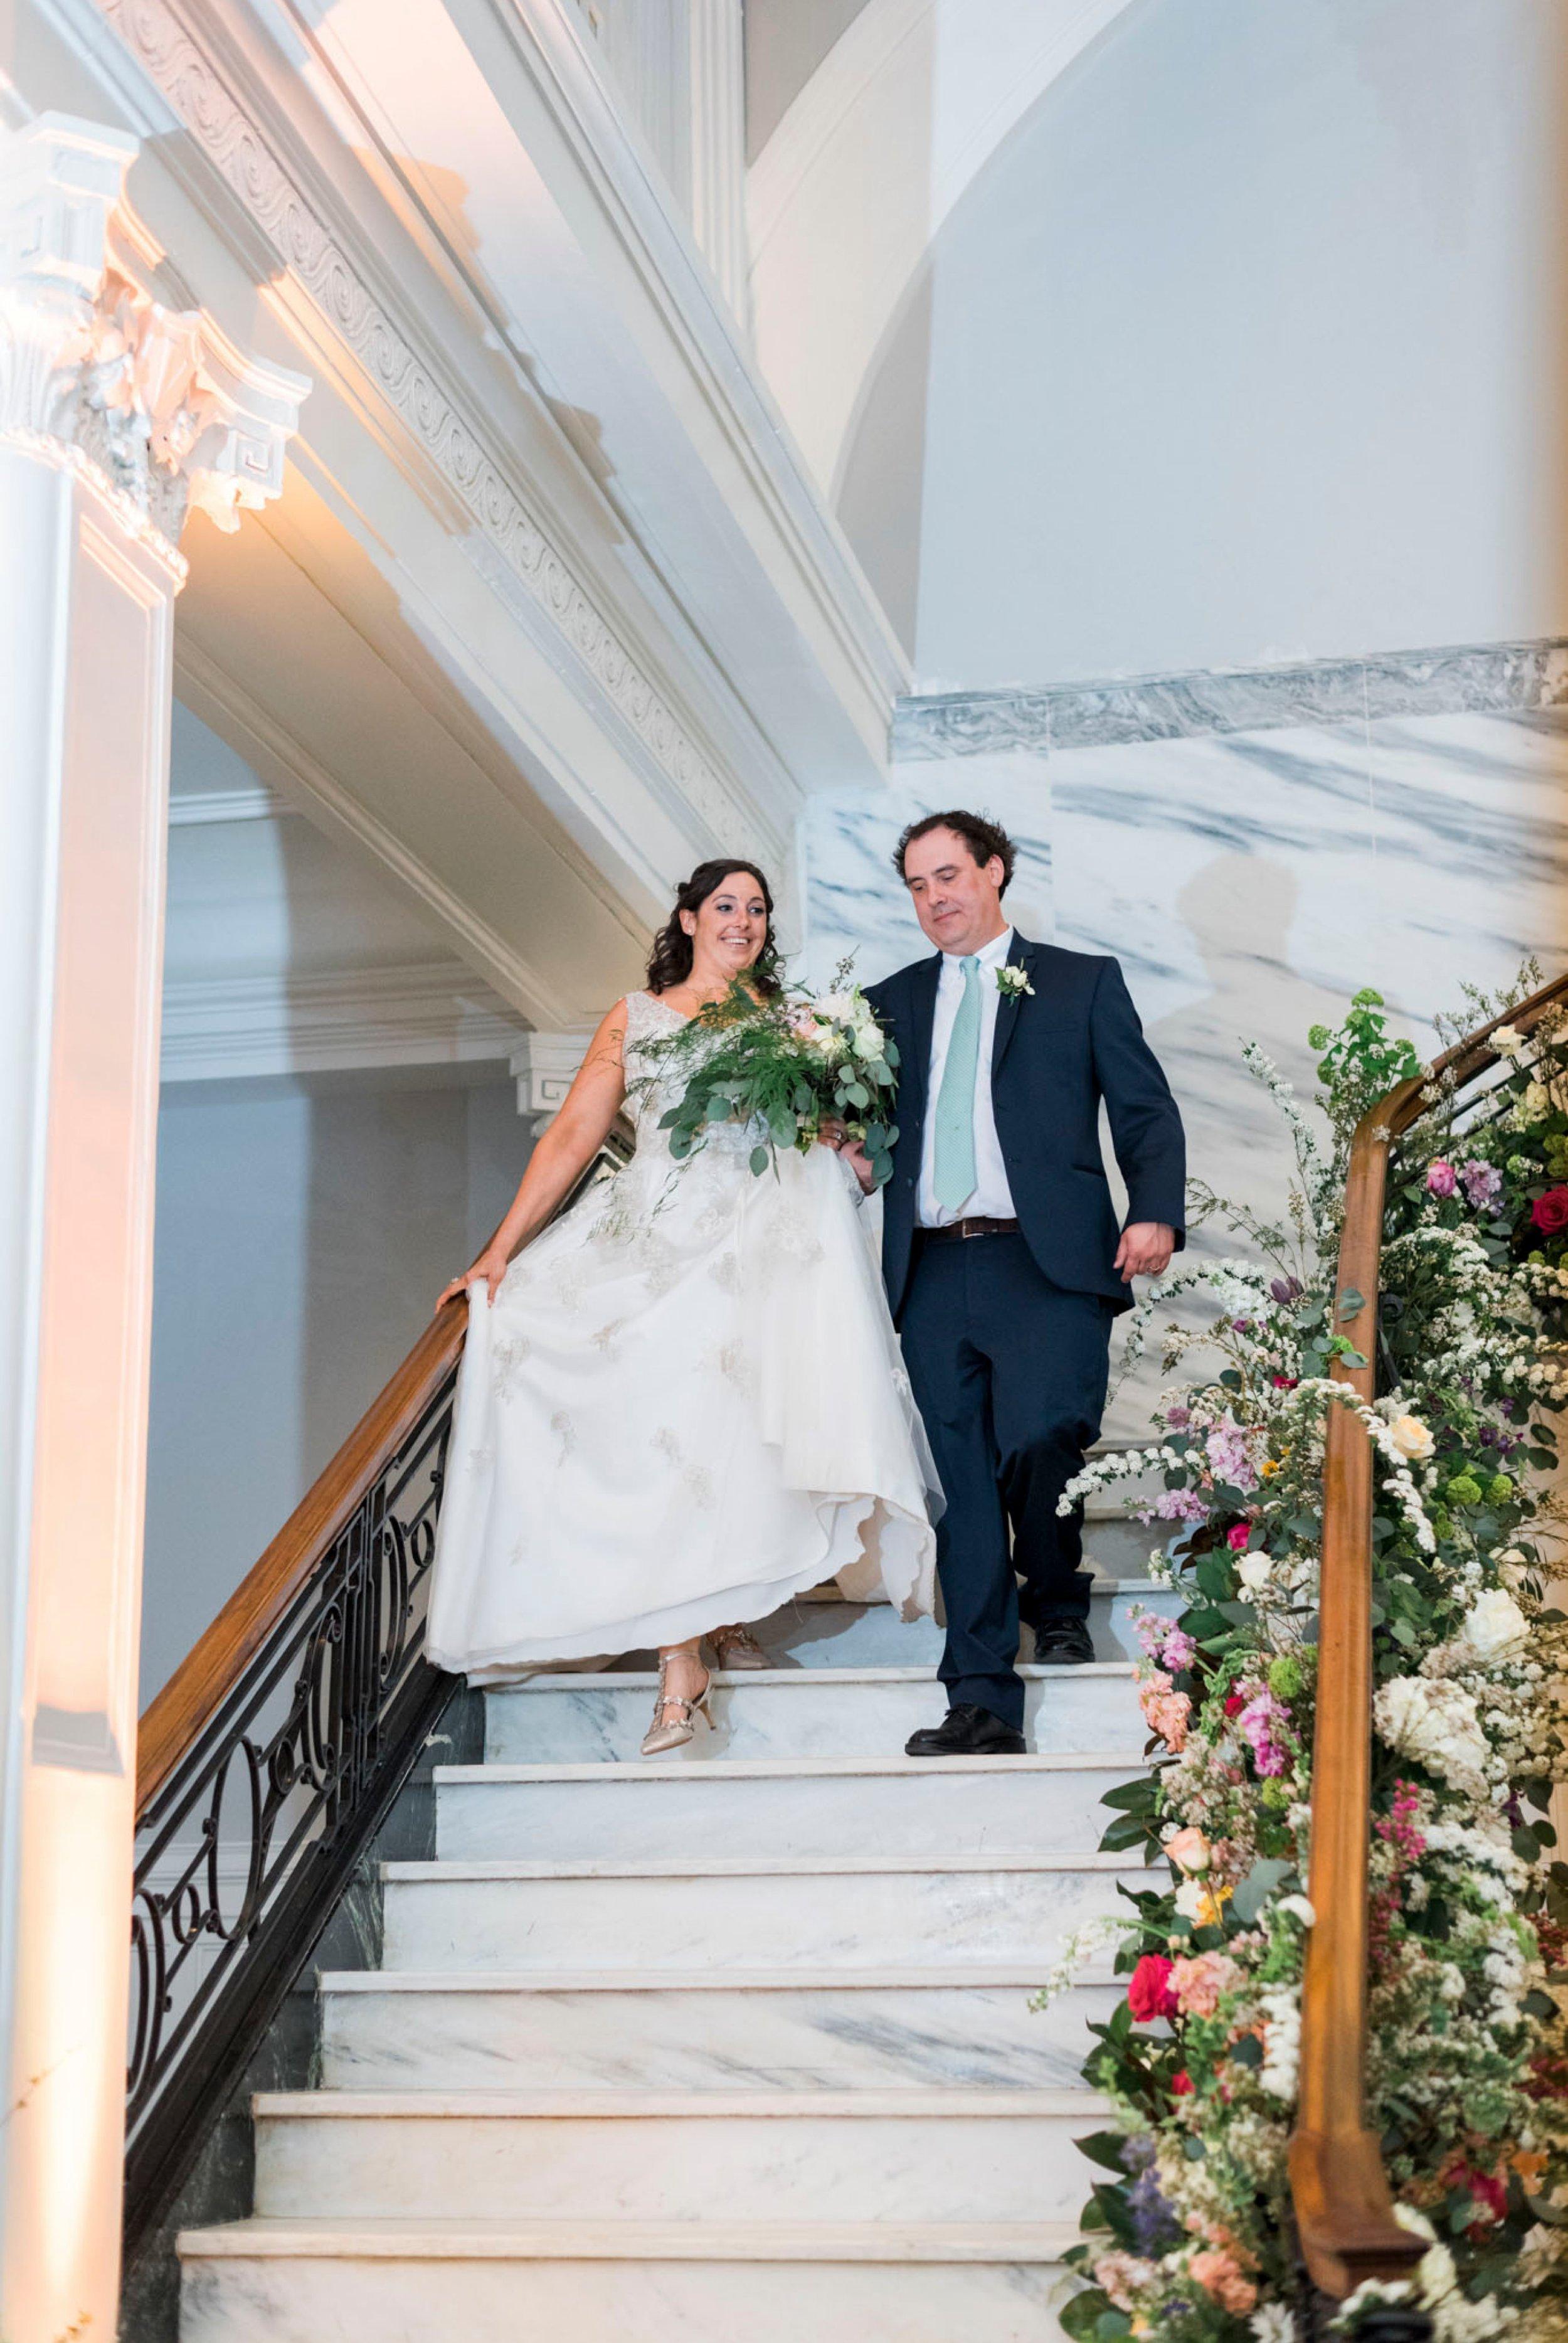 TheVirginianHotel_LynchburgVA_TheVirginianHotelWedding_Virginiaweddingphotographer_Lynchburgvawedding 12.jpg